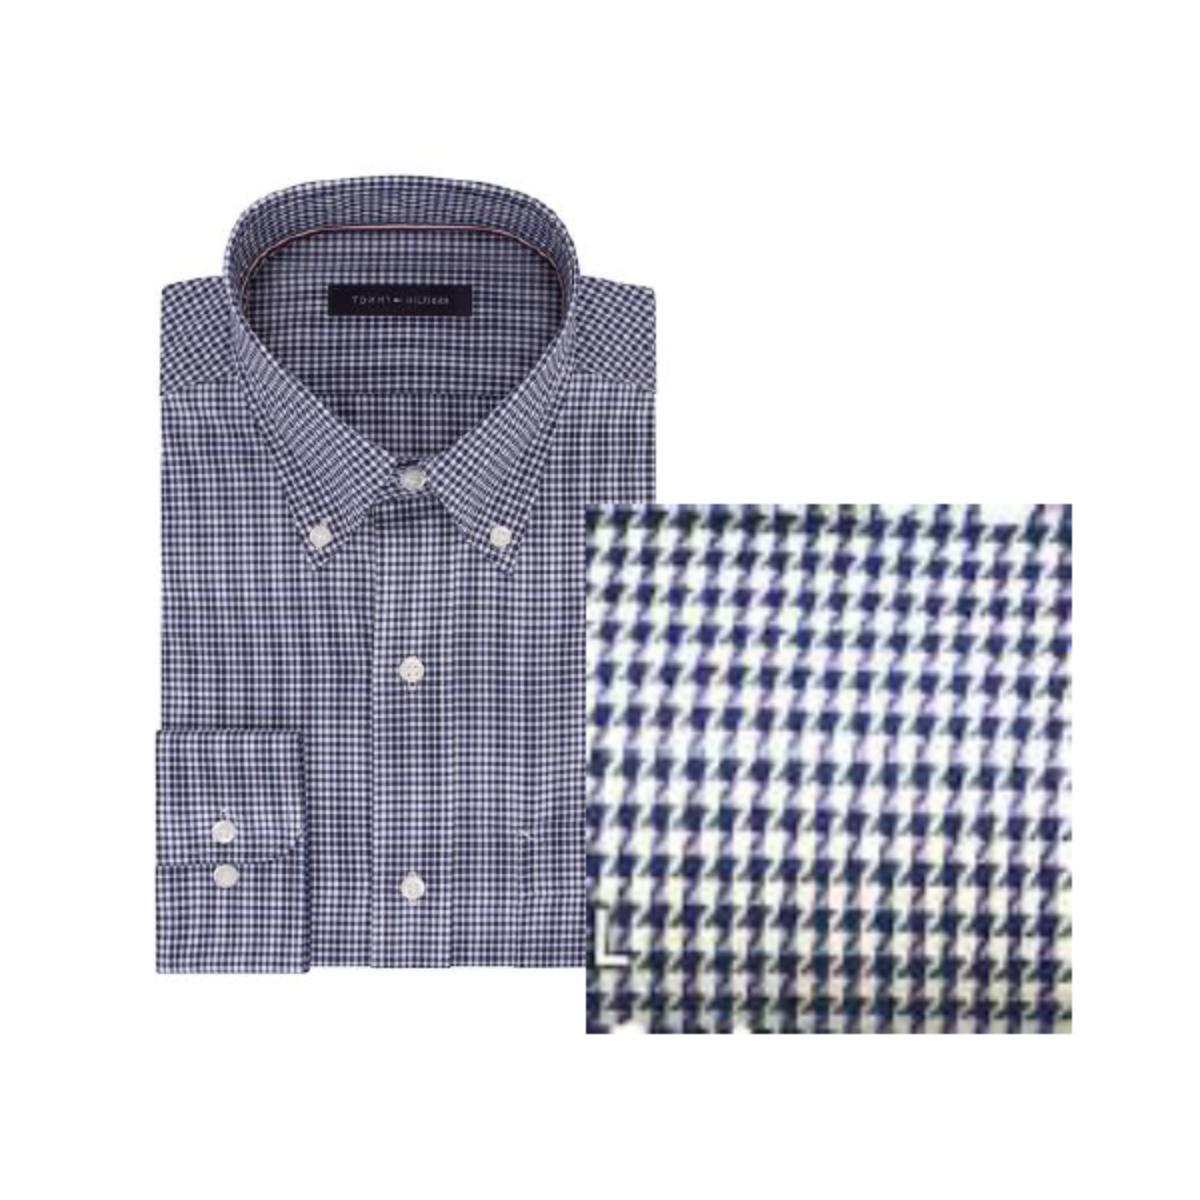 Camisa Masculina Tommy Th17fl737 Th461 Azul/branco